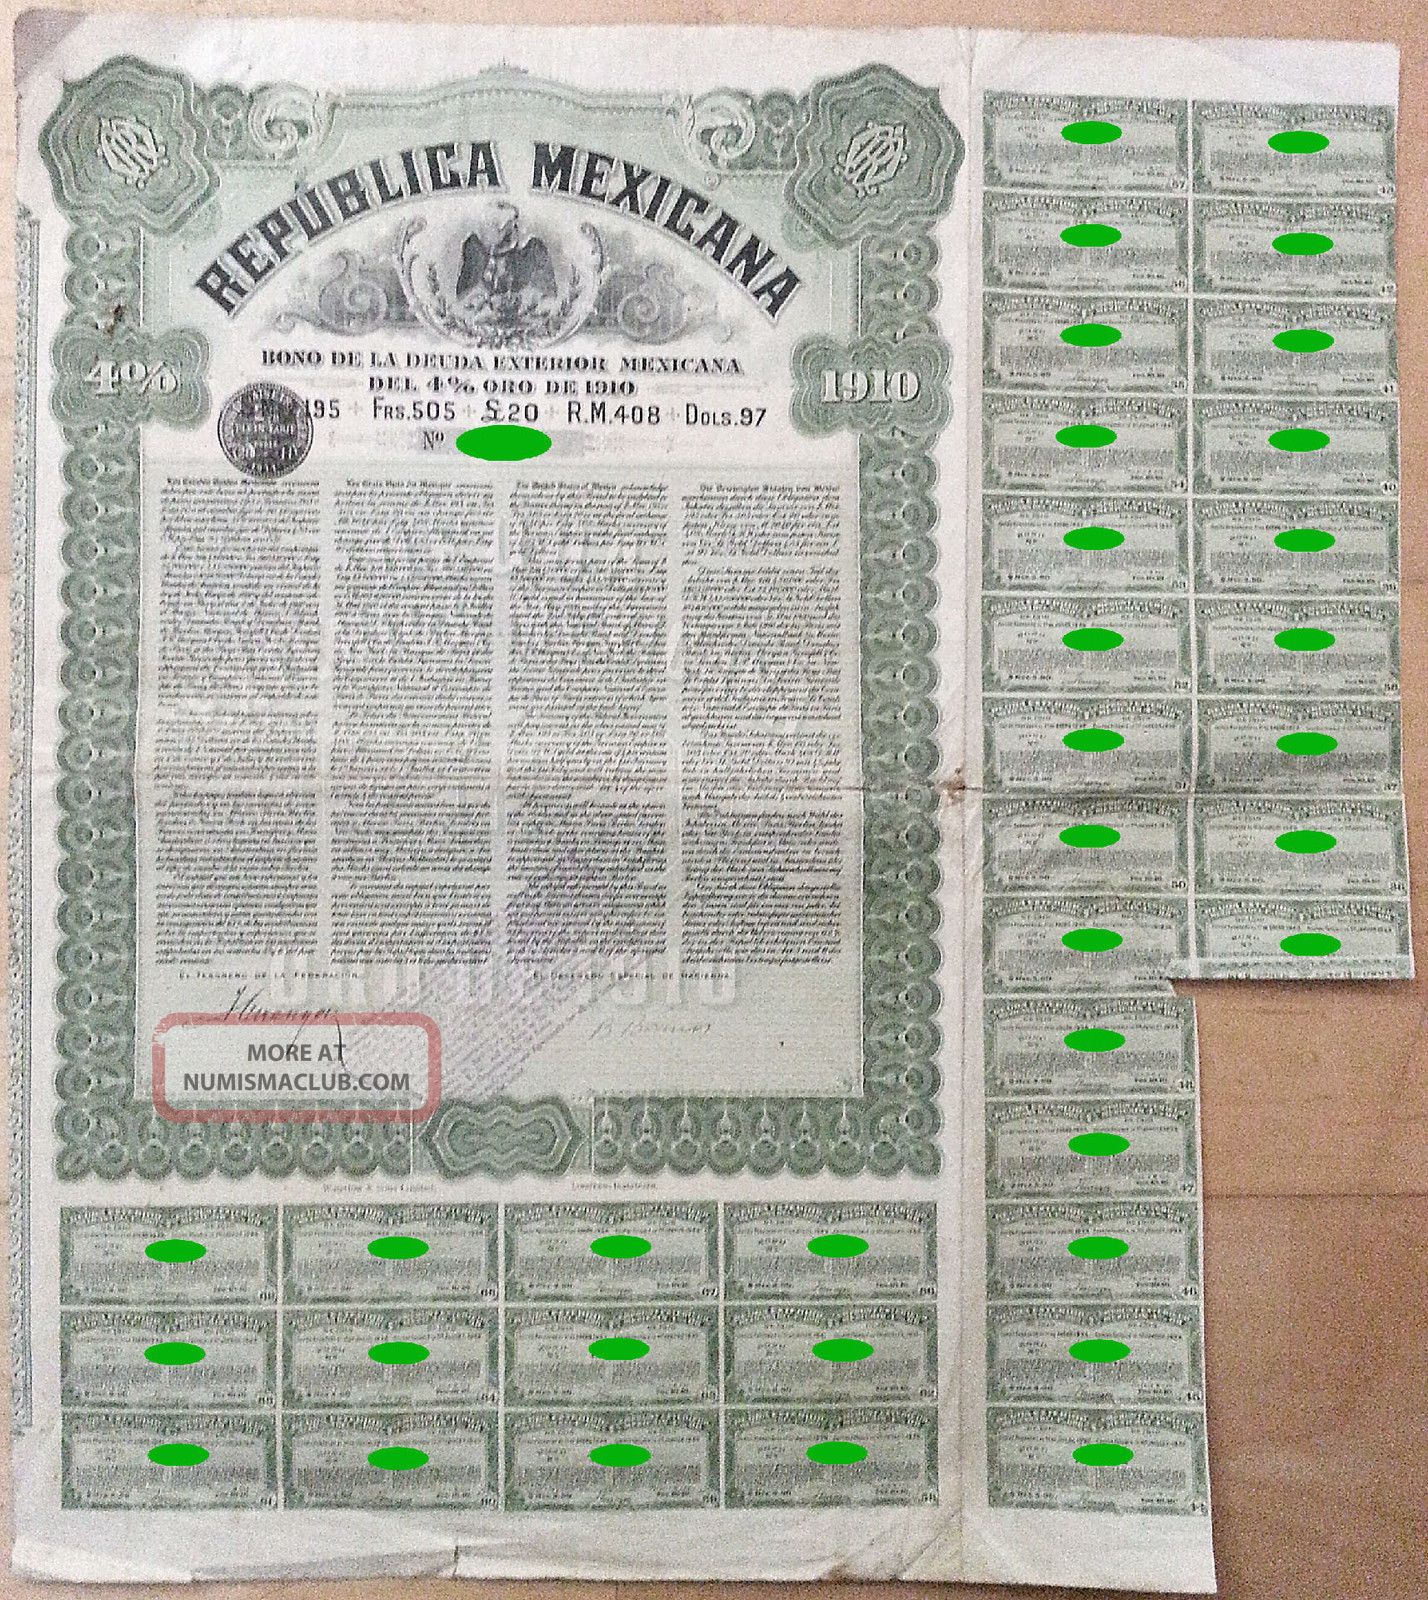 Mexico - Republica Mexicana 4 Gold Loan 20£ 1910 Stocks & Bonds, Scripophily photo